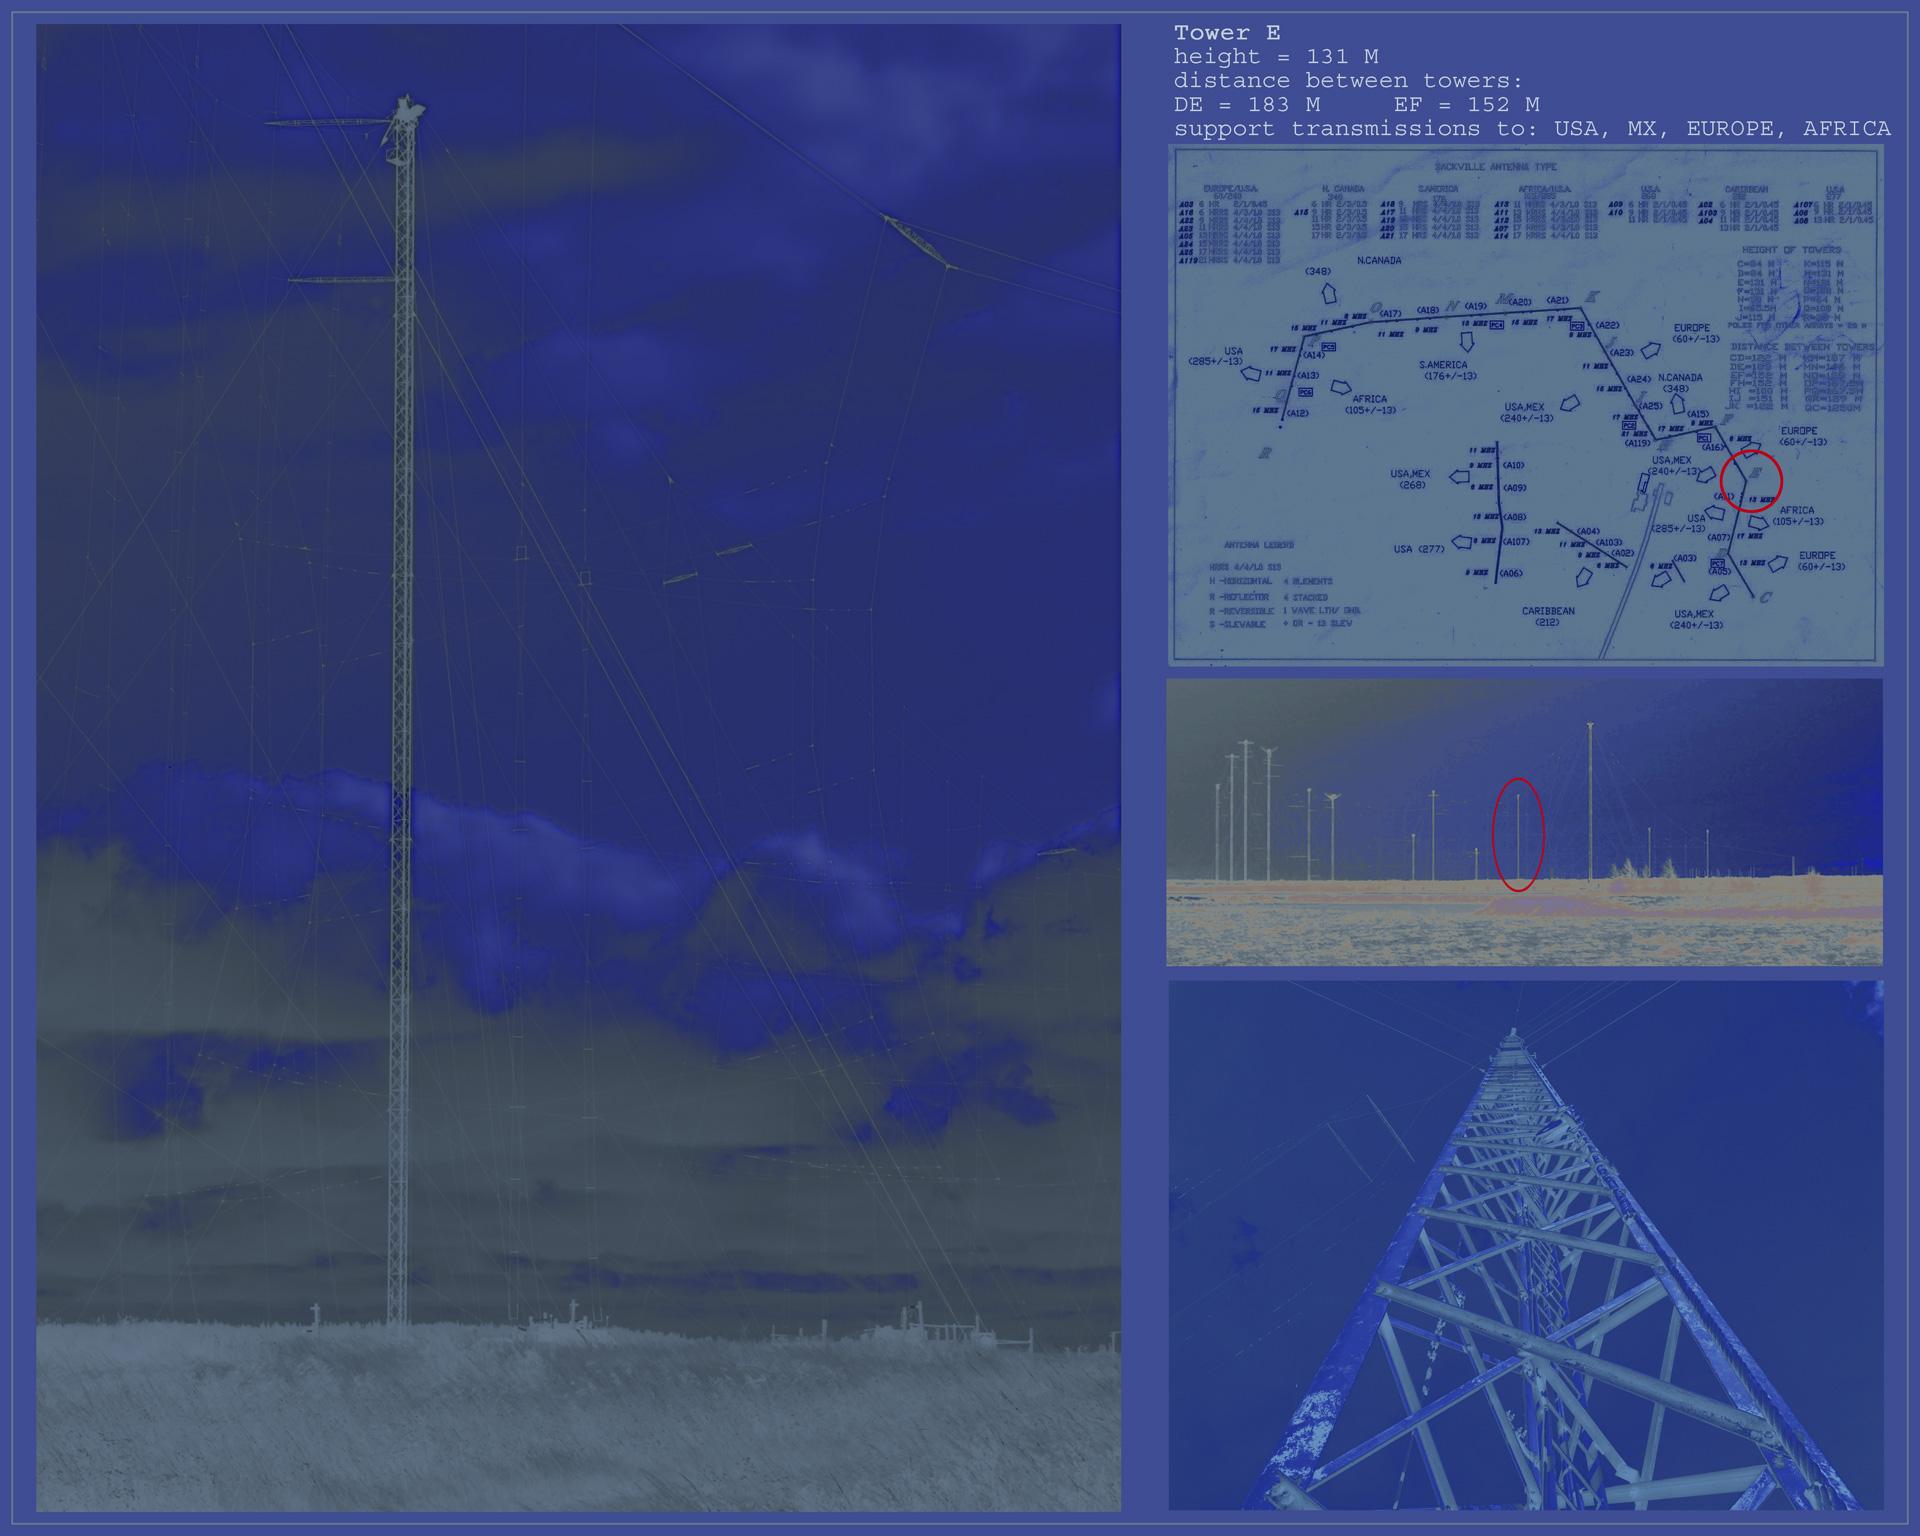 Requiem for Radio: Pulse Decay - E tower